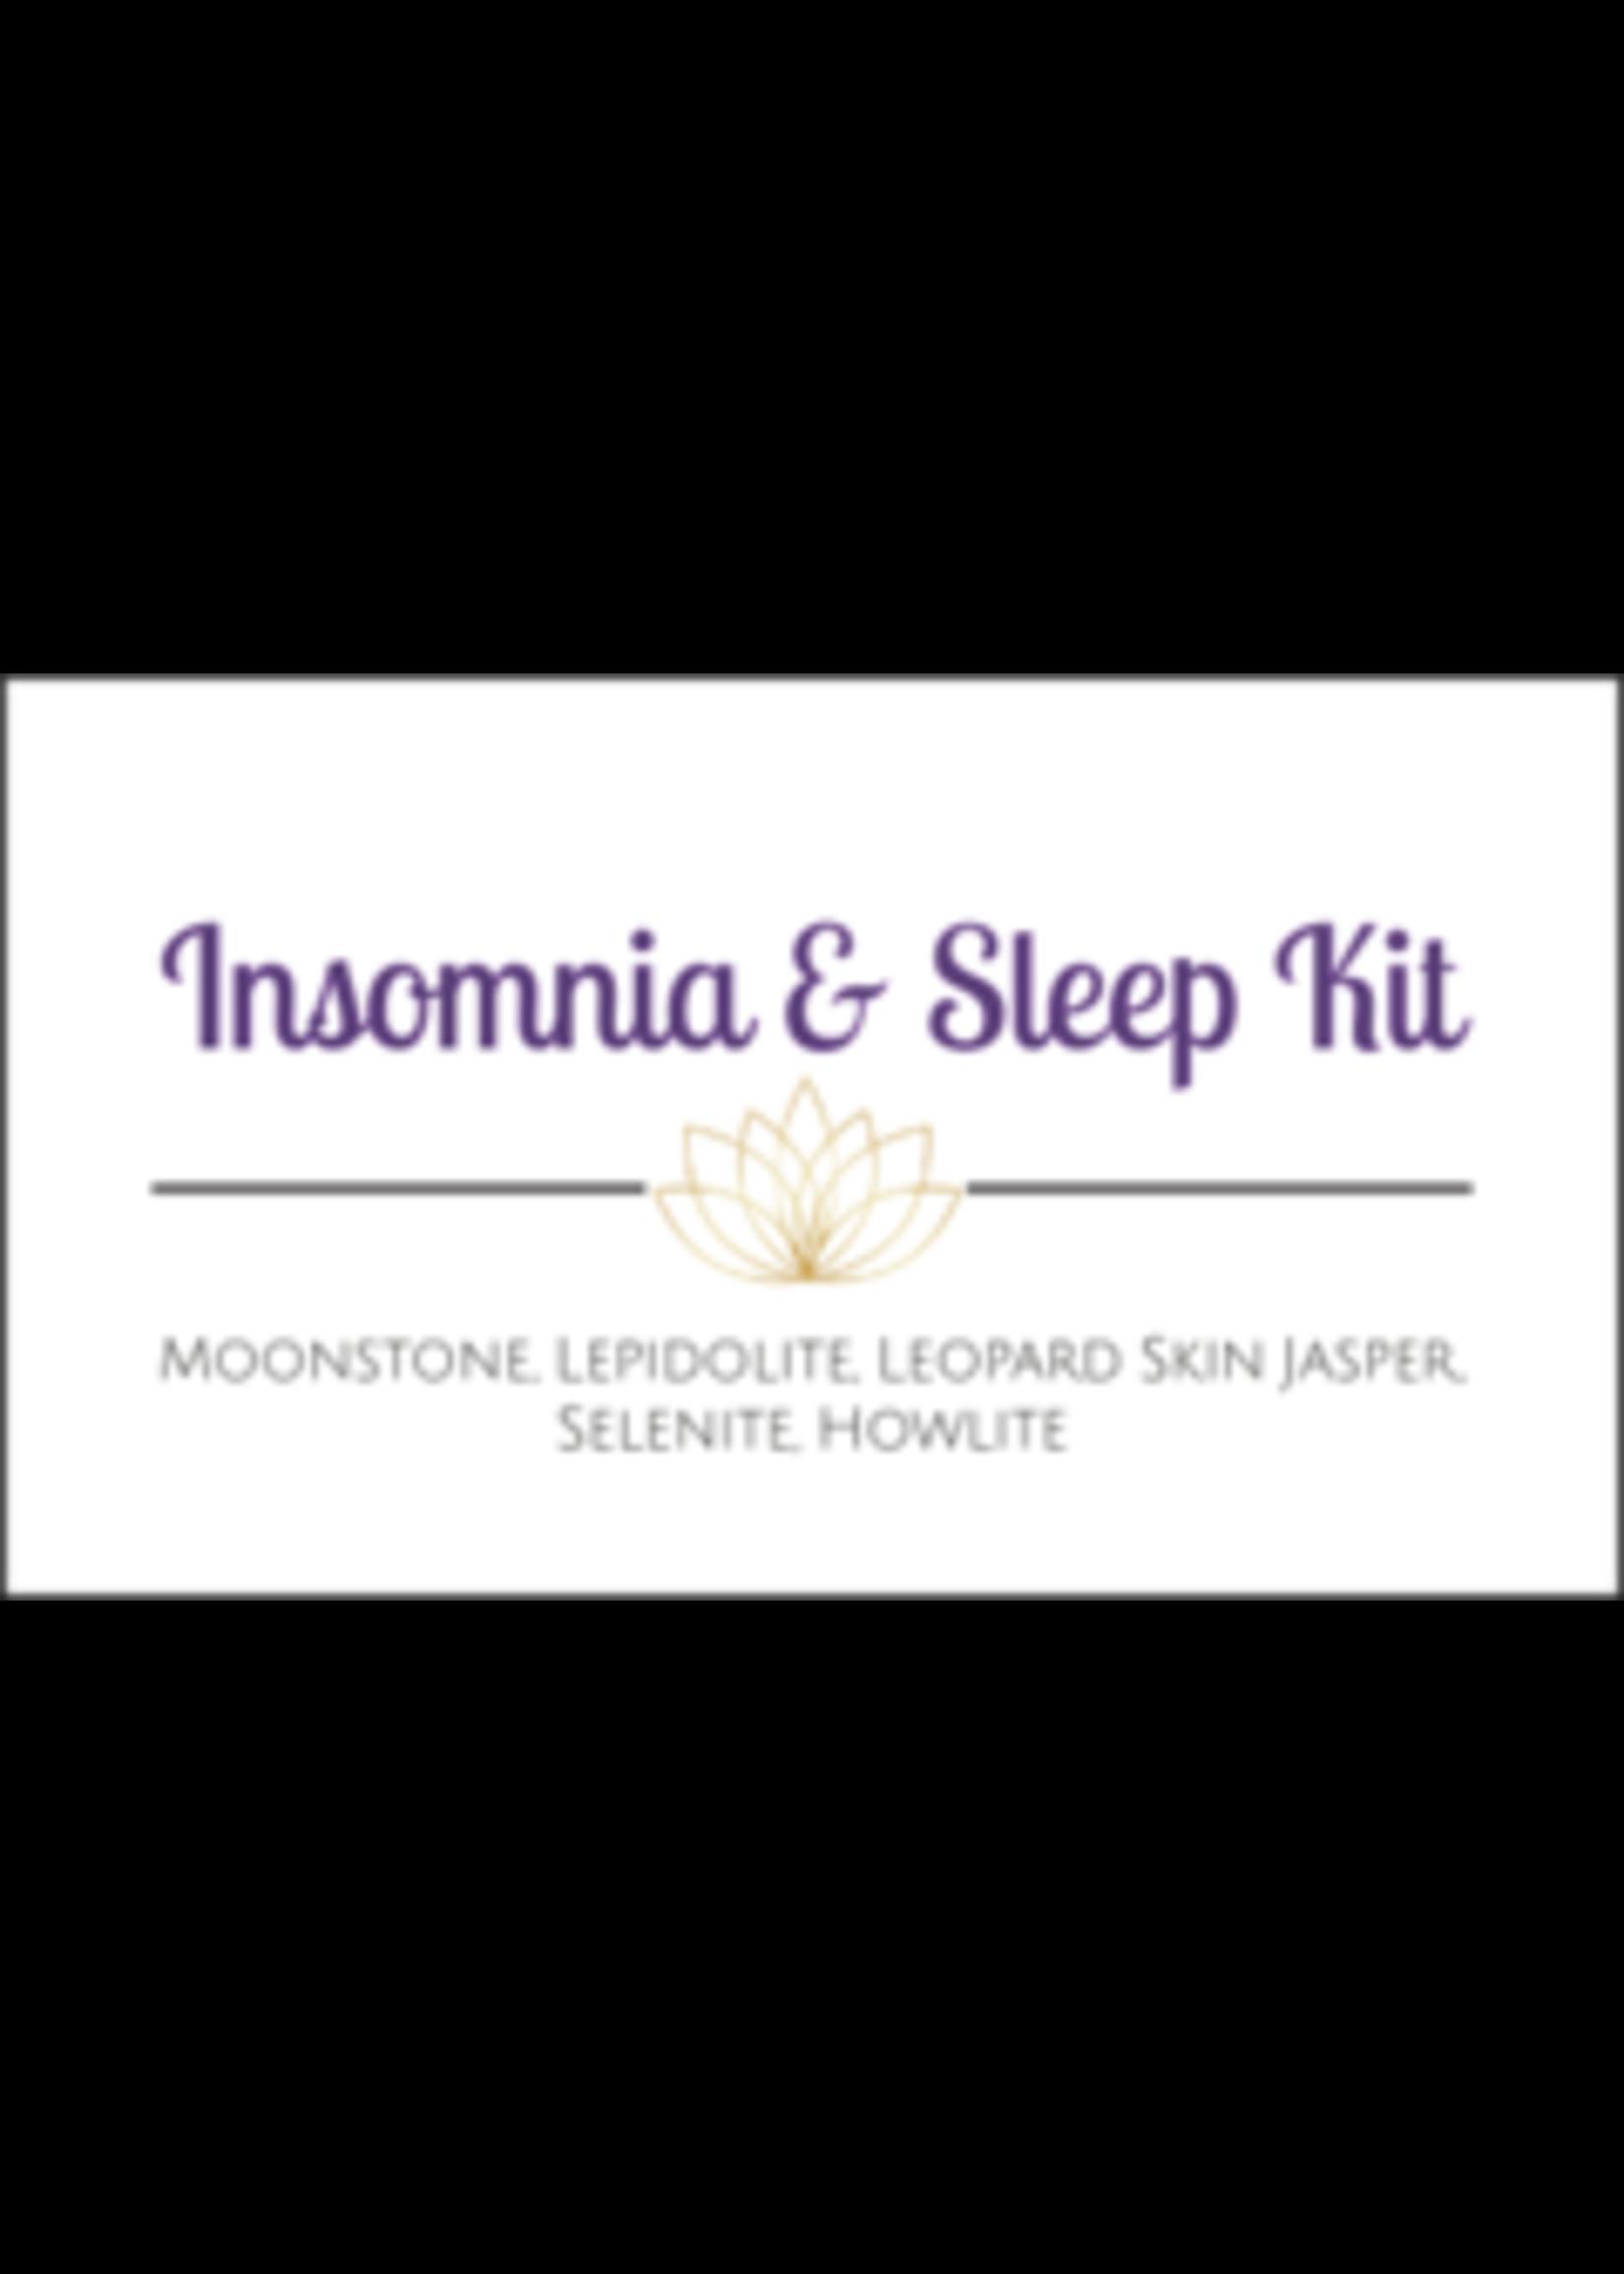 Insomnia & Sleep Crystal Kit Cards - Box of 100